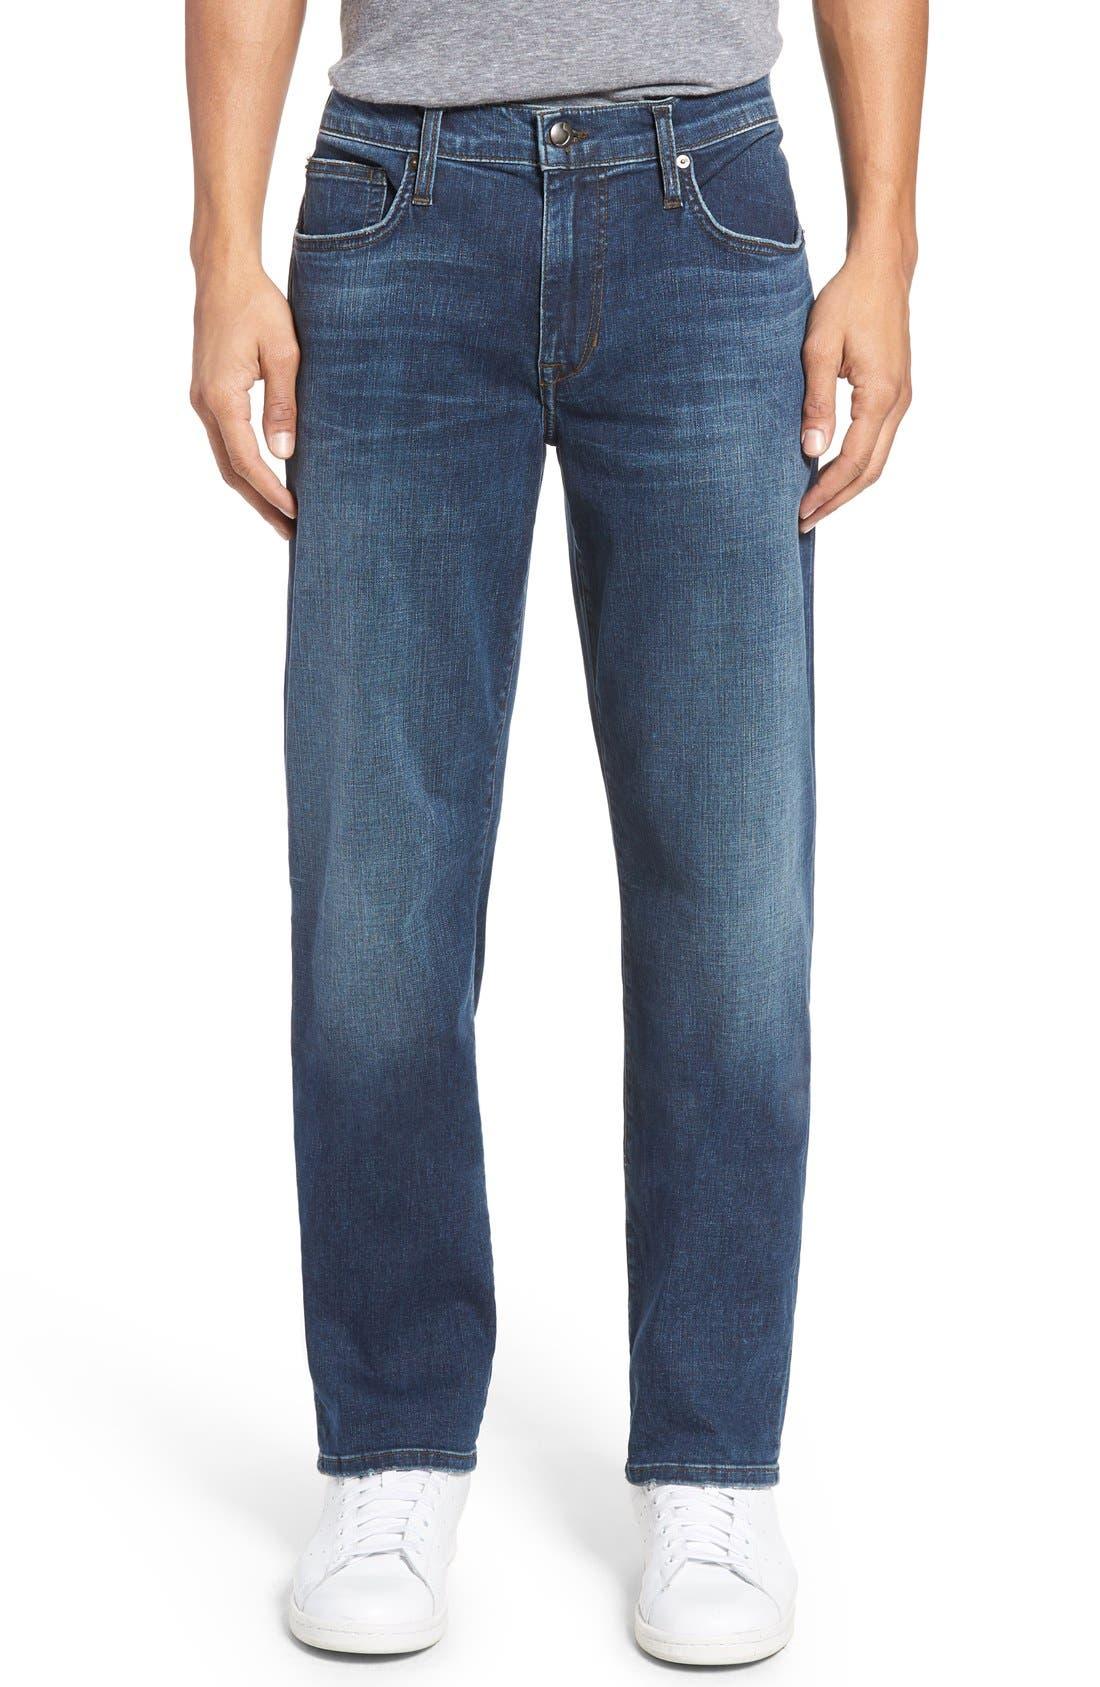 Main Image - Joe's Brixton Slim Fit Jeans (Gladwin)